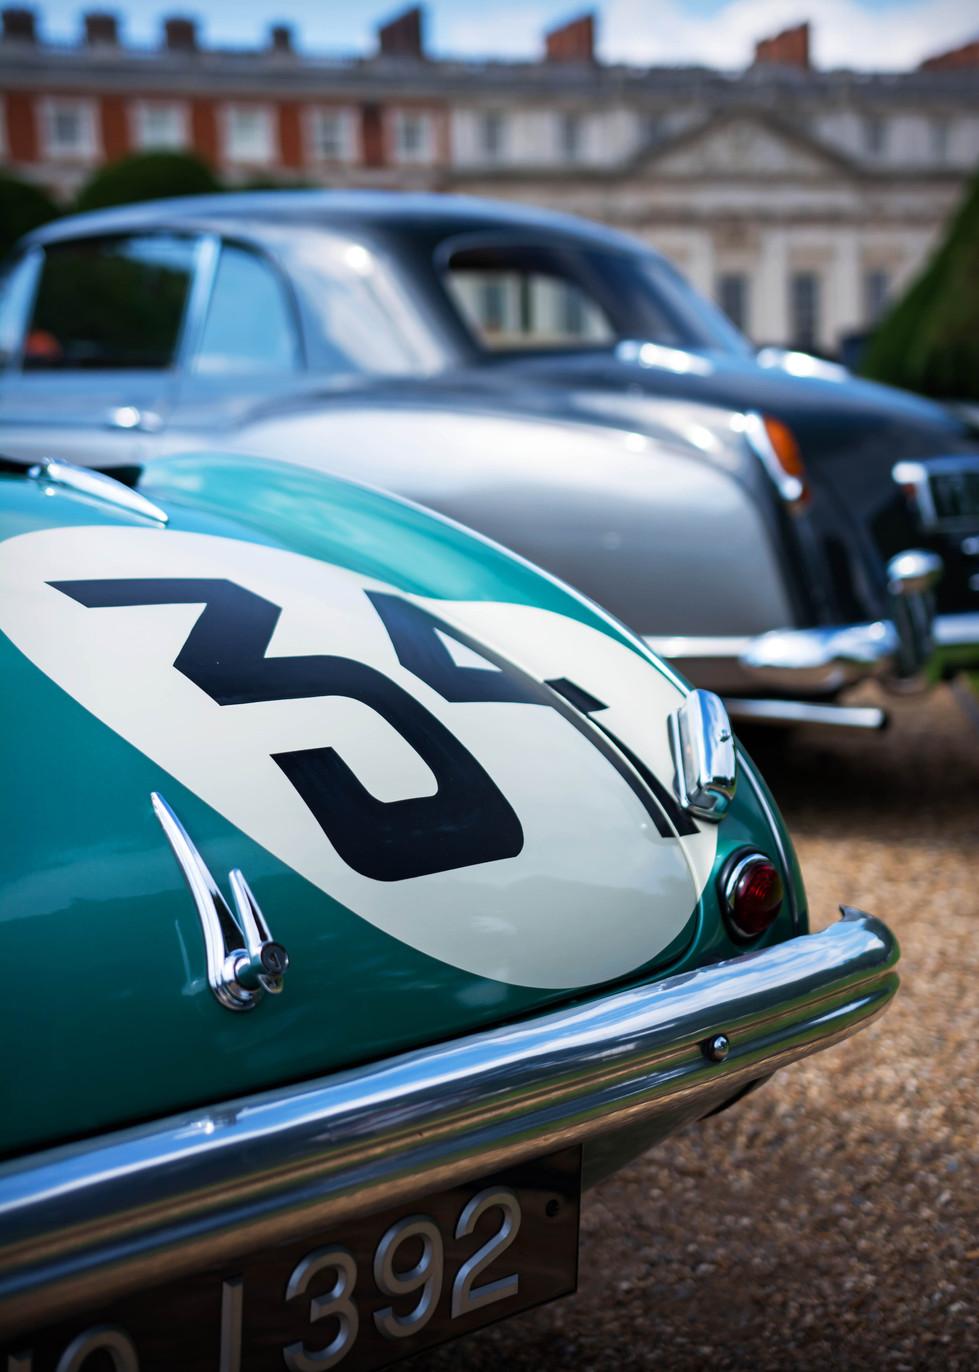 1953 Austin Healey 100 Special Test Car